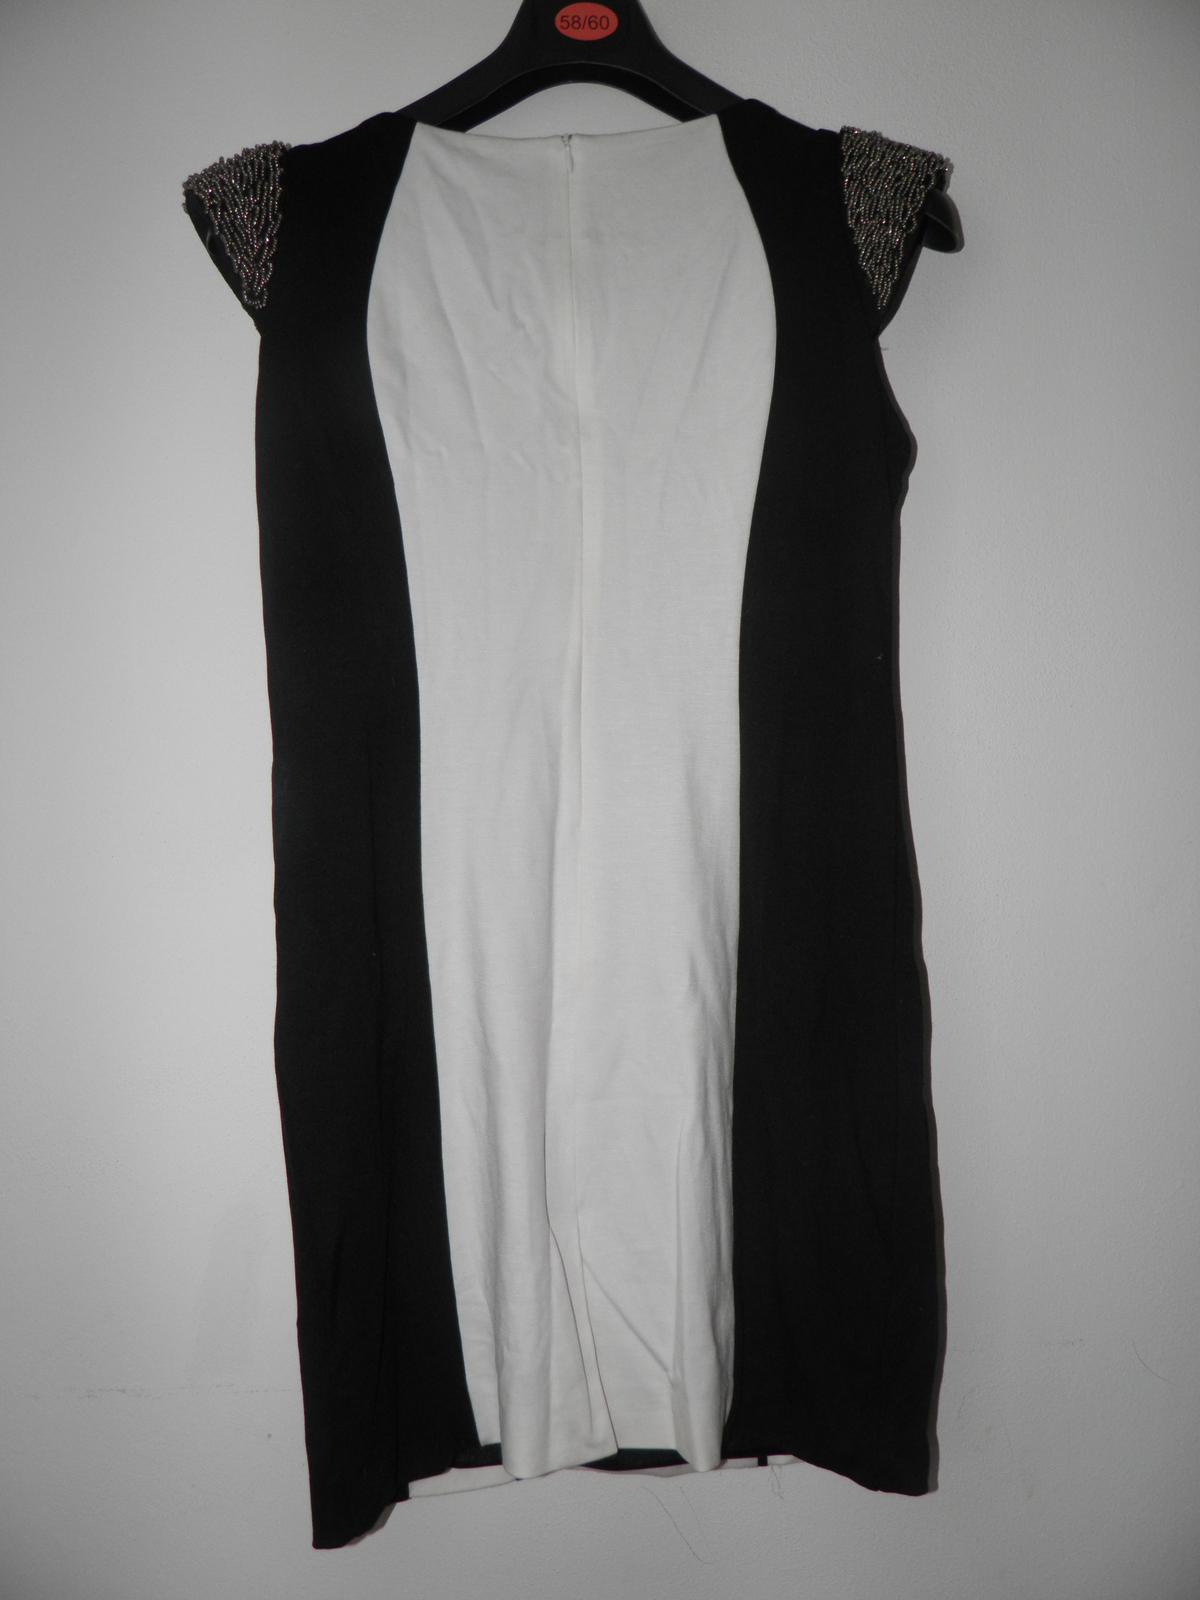 luxusné šaty z butiku, sedia na L/XL - Obrázok č. 4